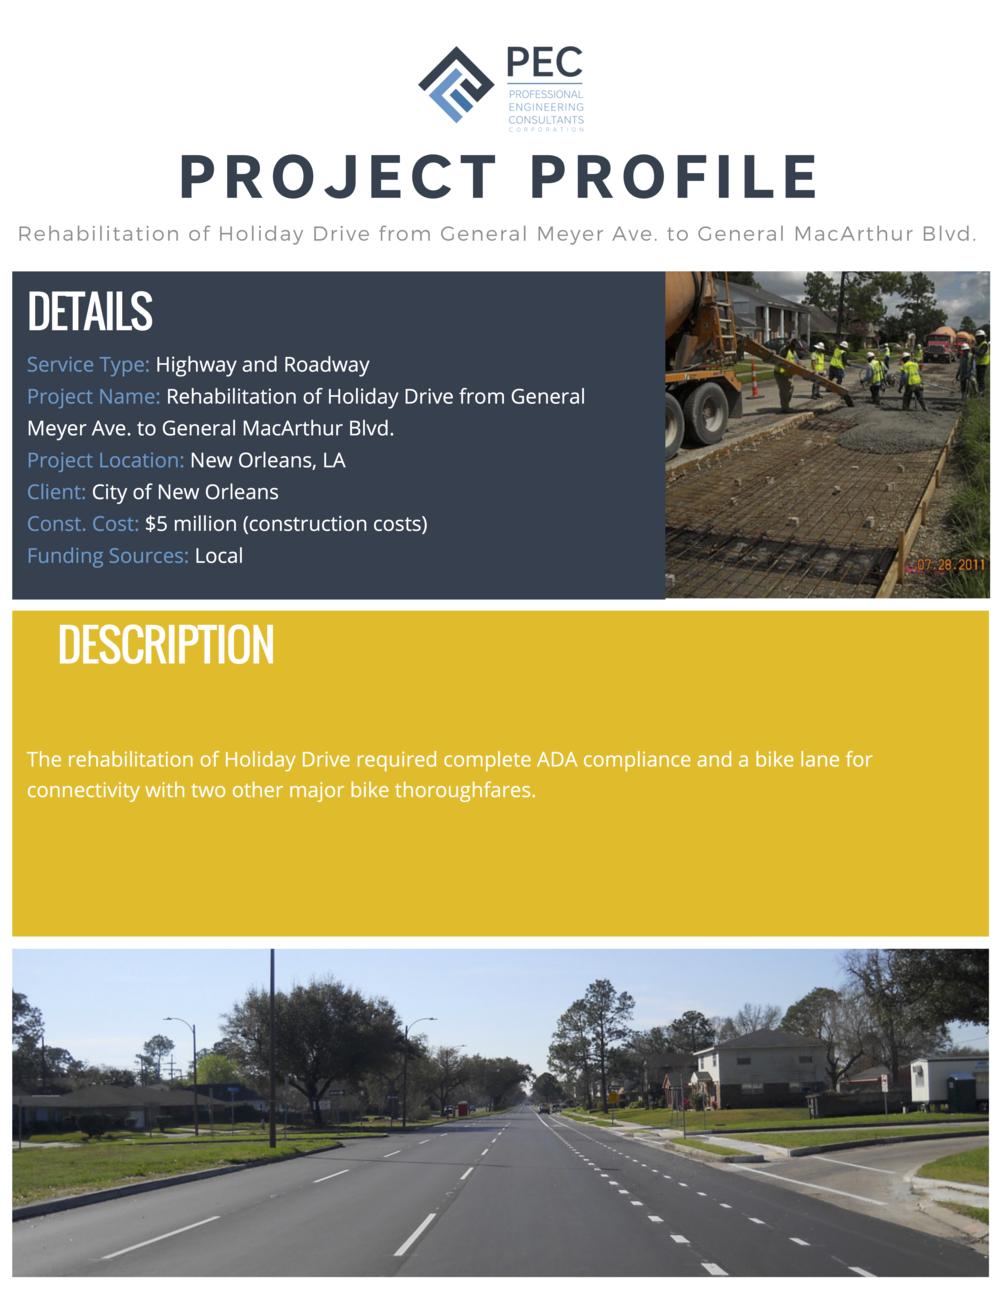 Project Profile_RehadbofHolidayDriveFINAL.jpg